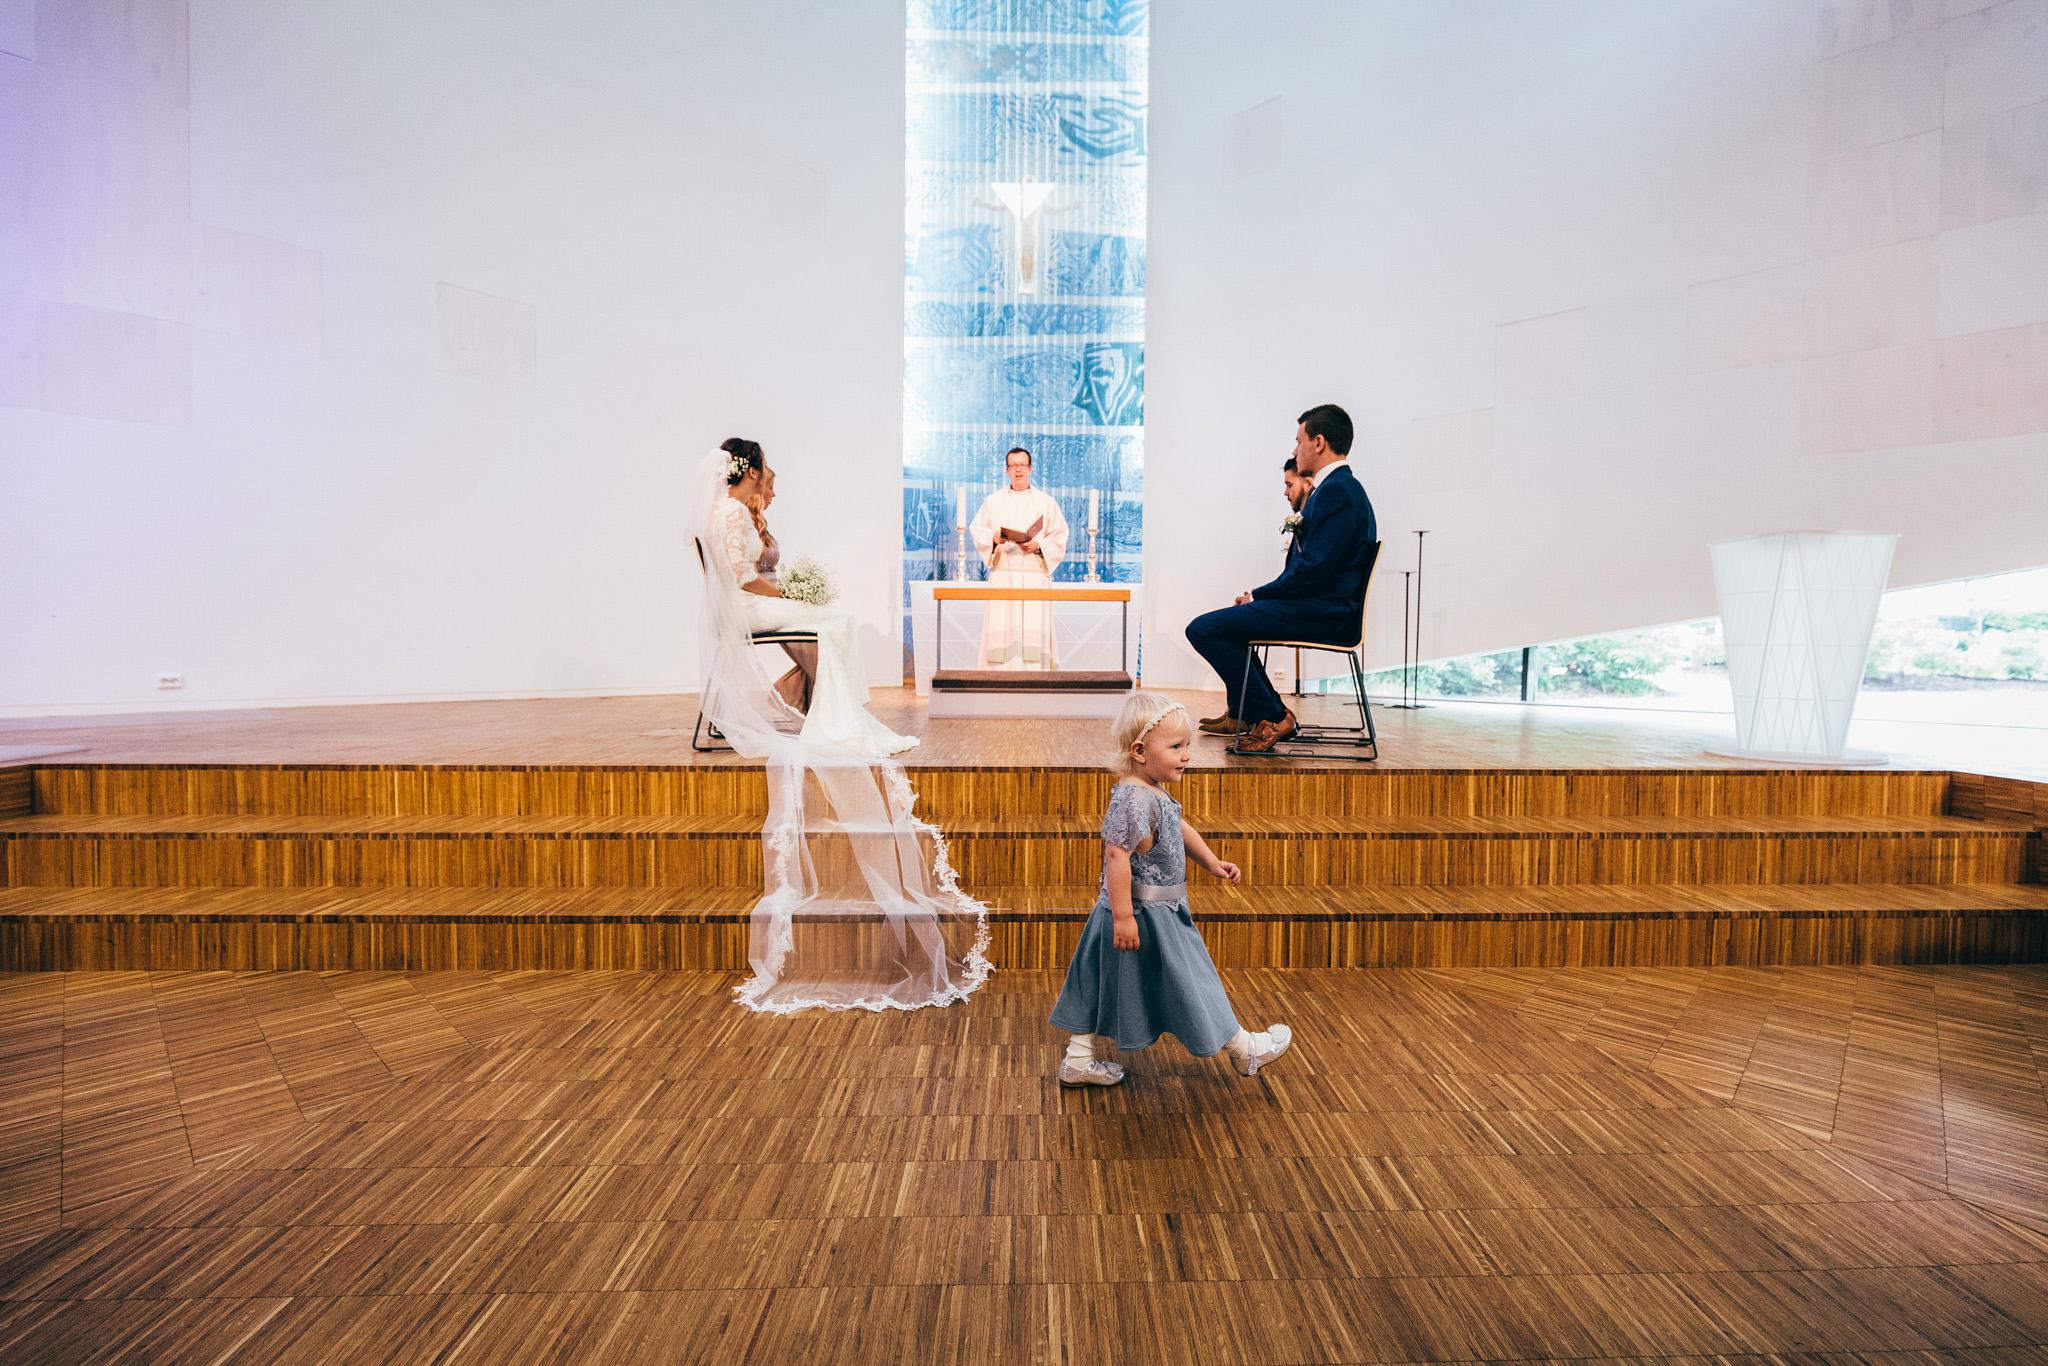 Norway+wedding+photographer+elopement+pre+wedding+Casey+Arneson-34.jpg